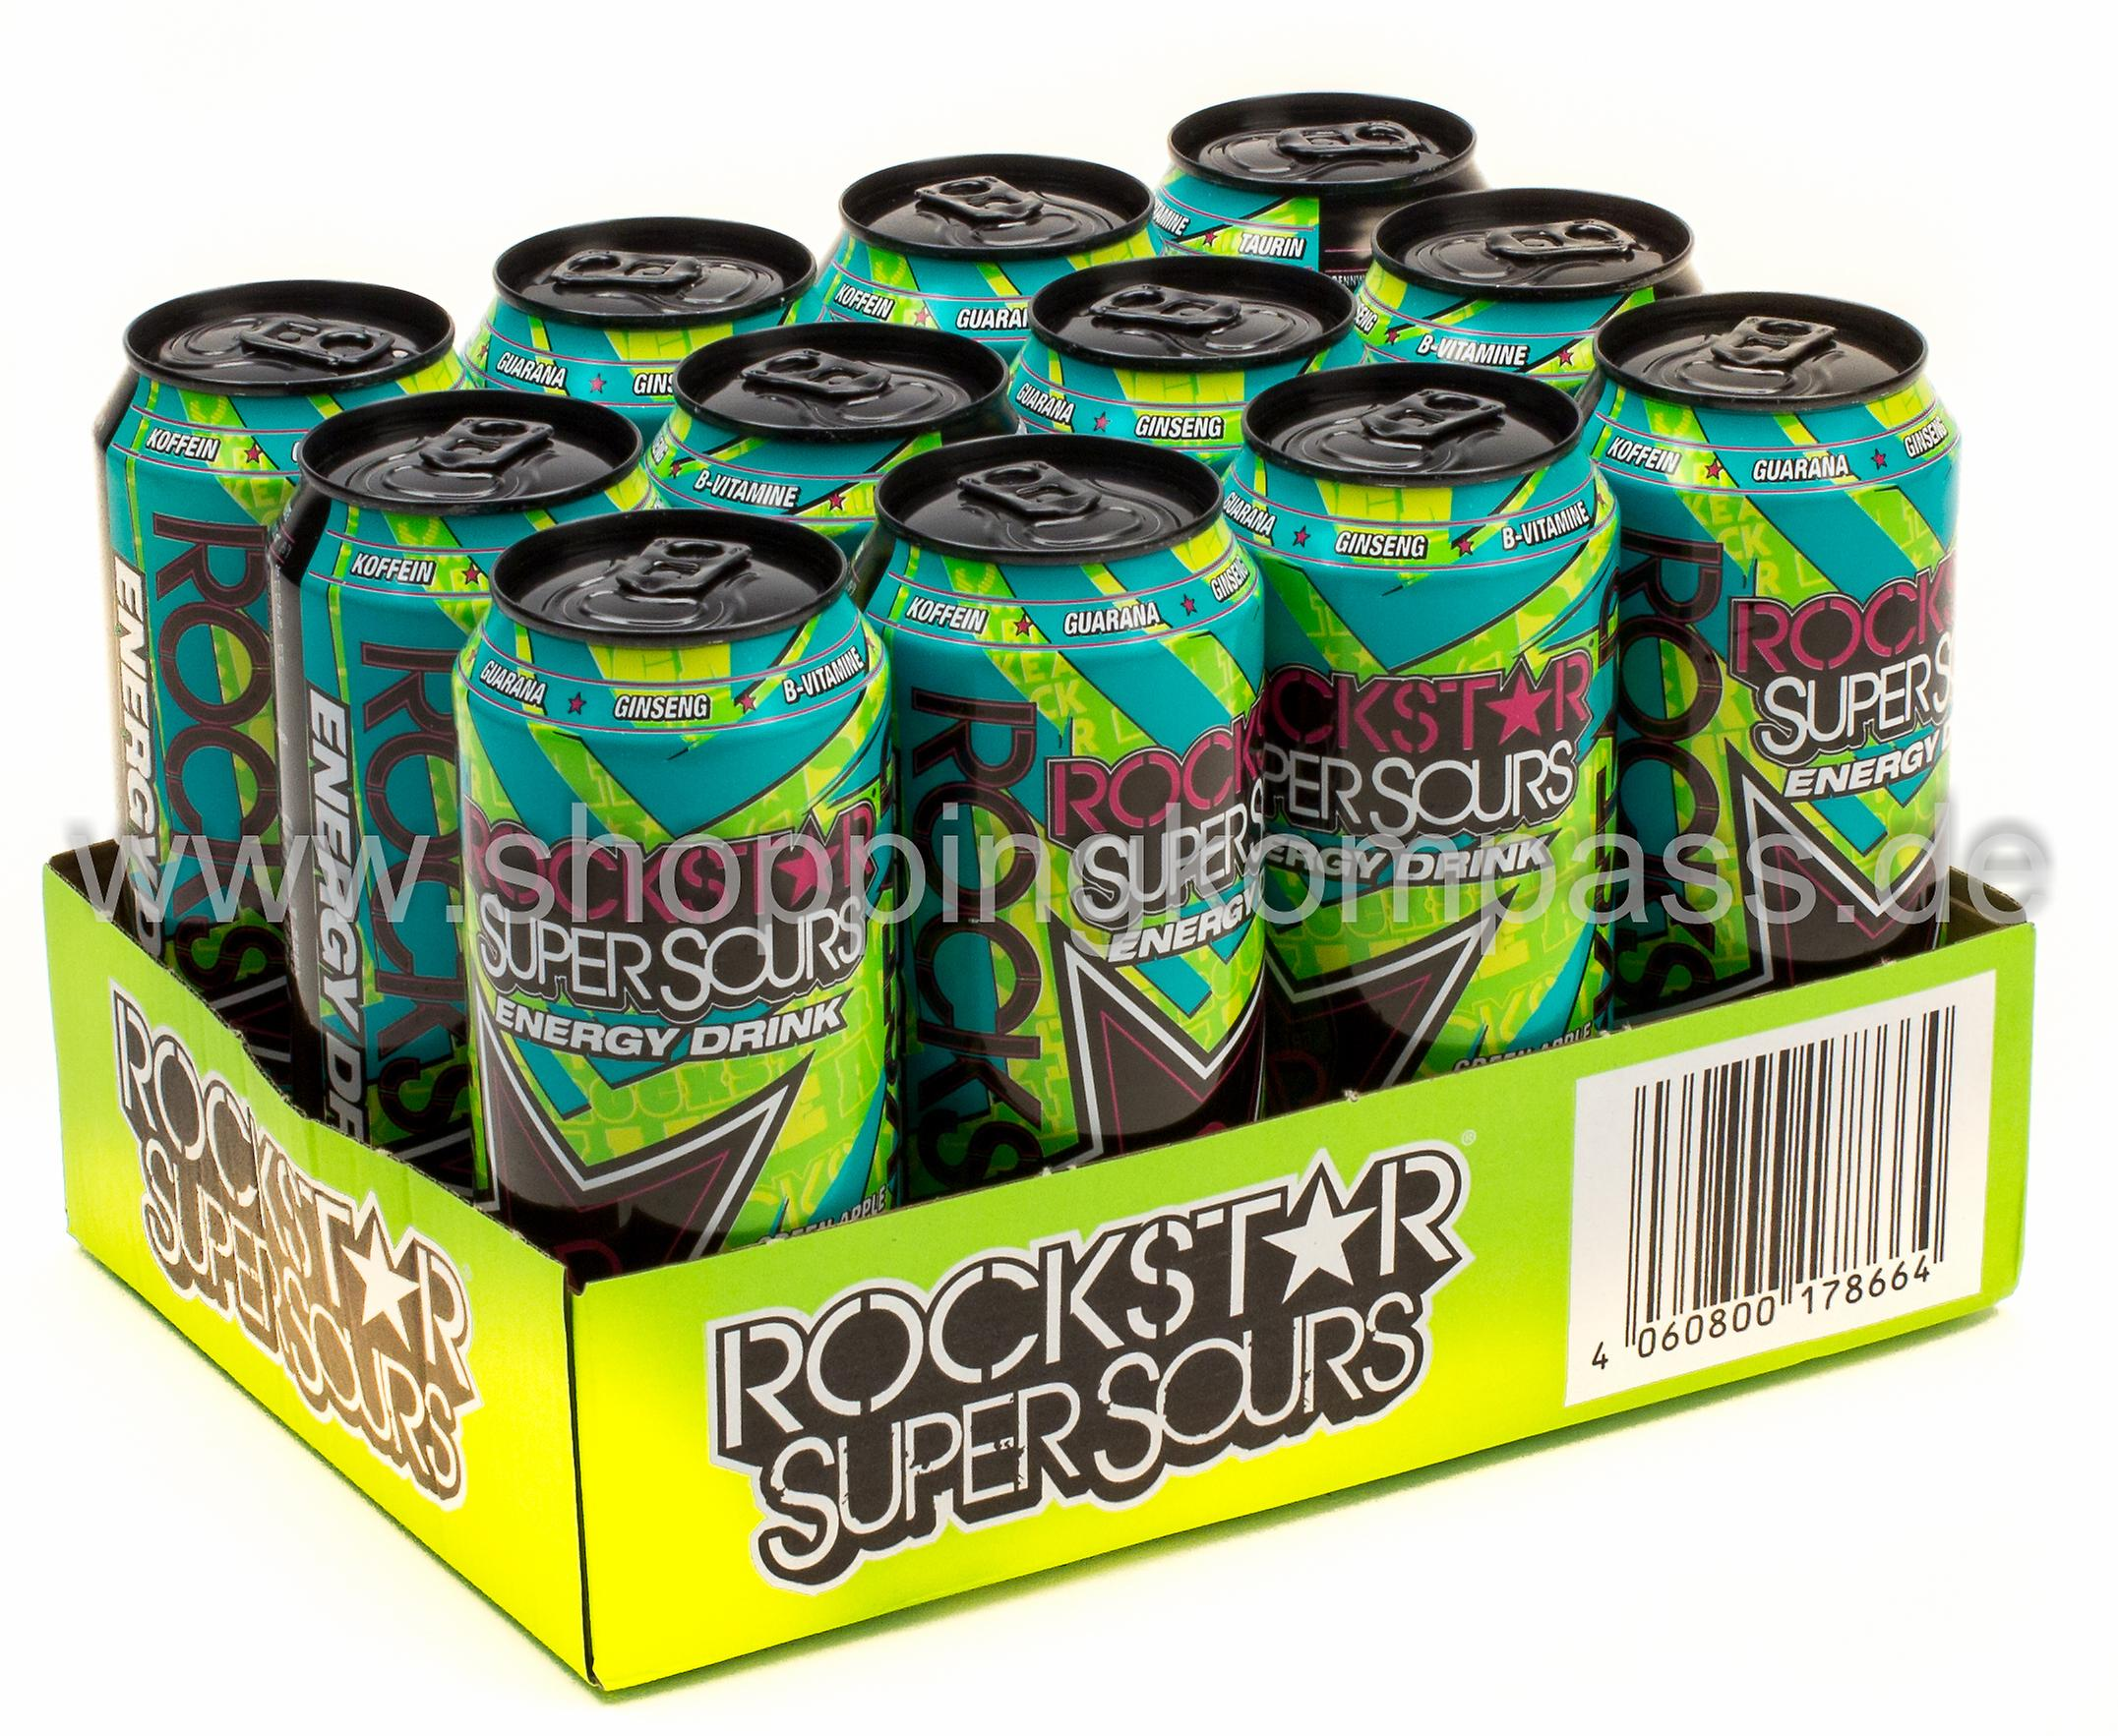 Energy-Drinks - Rockstar Energy Drink Super Sour Green Apple Karton ...